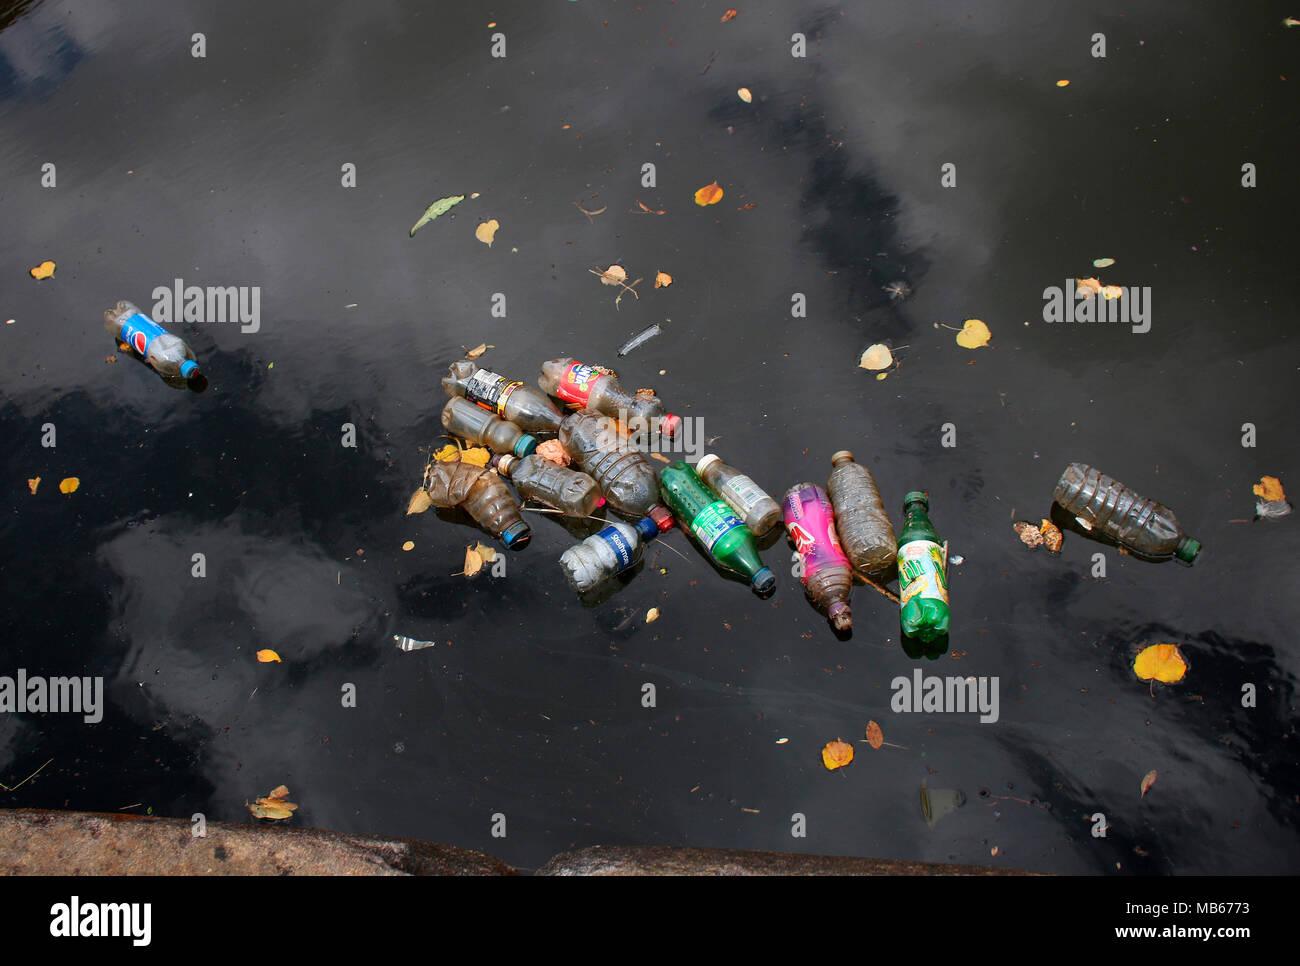 Abfall im Kanal, Manchester, England. Stock Photo